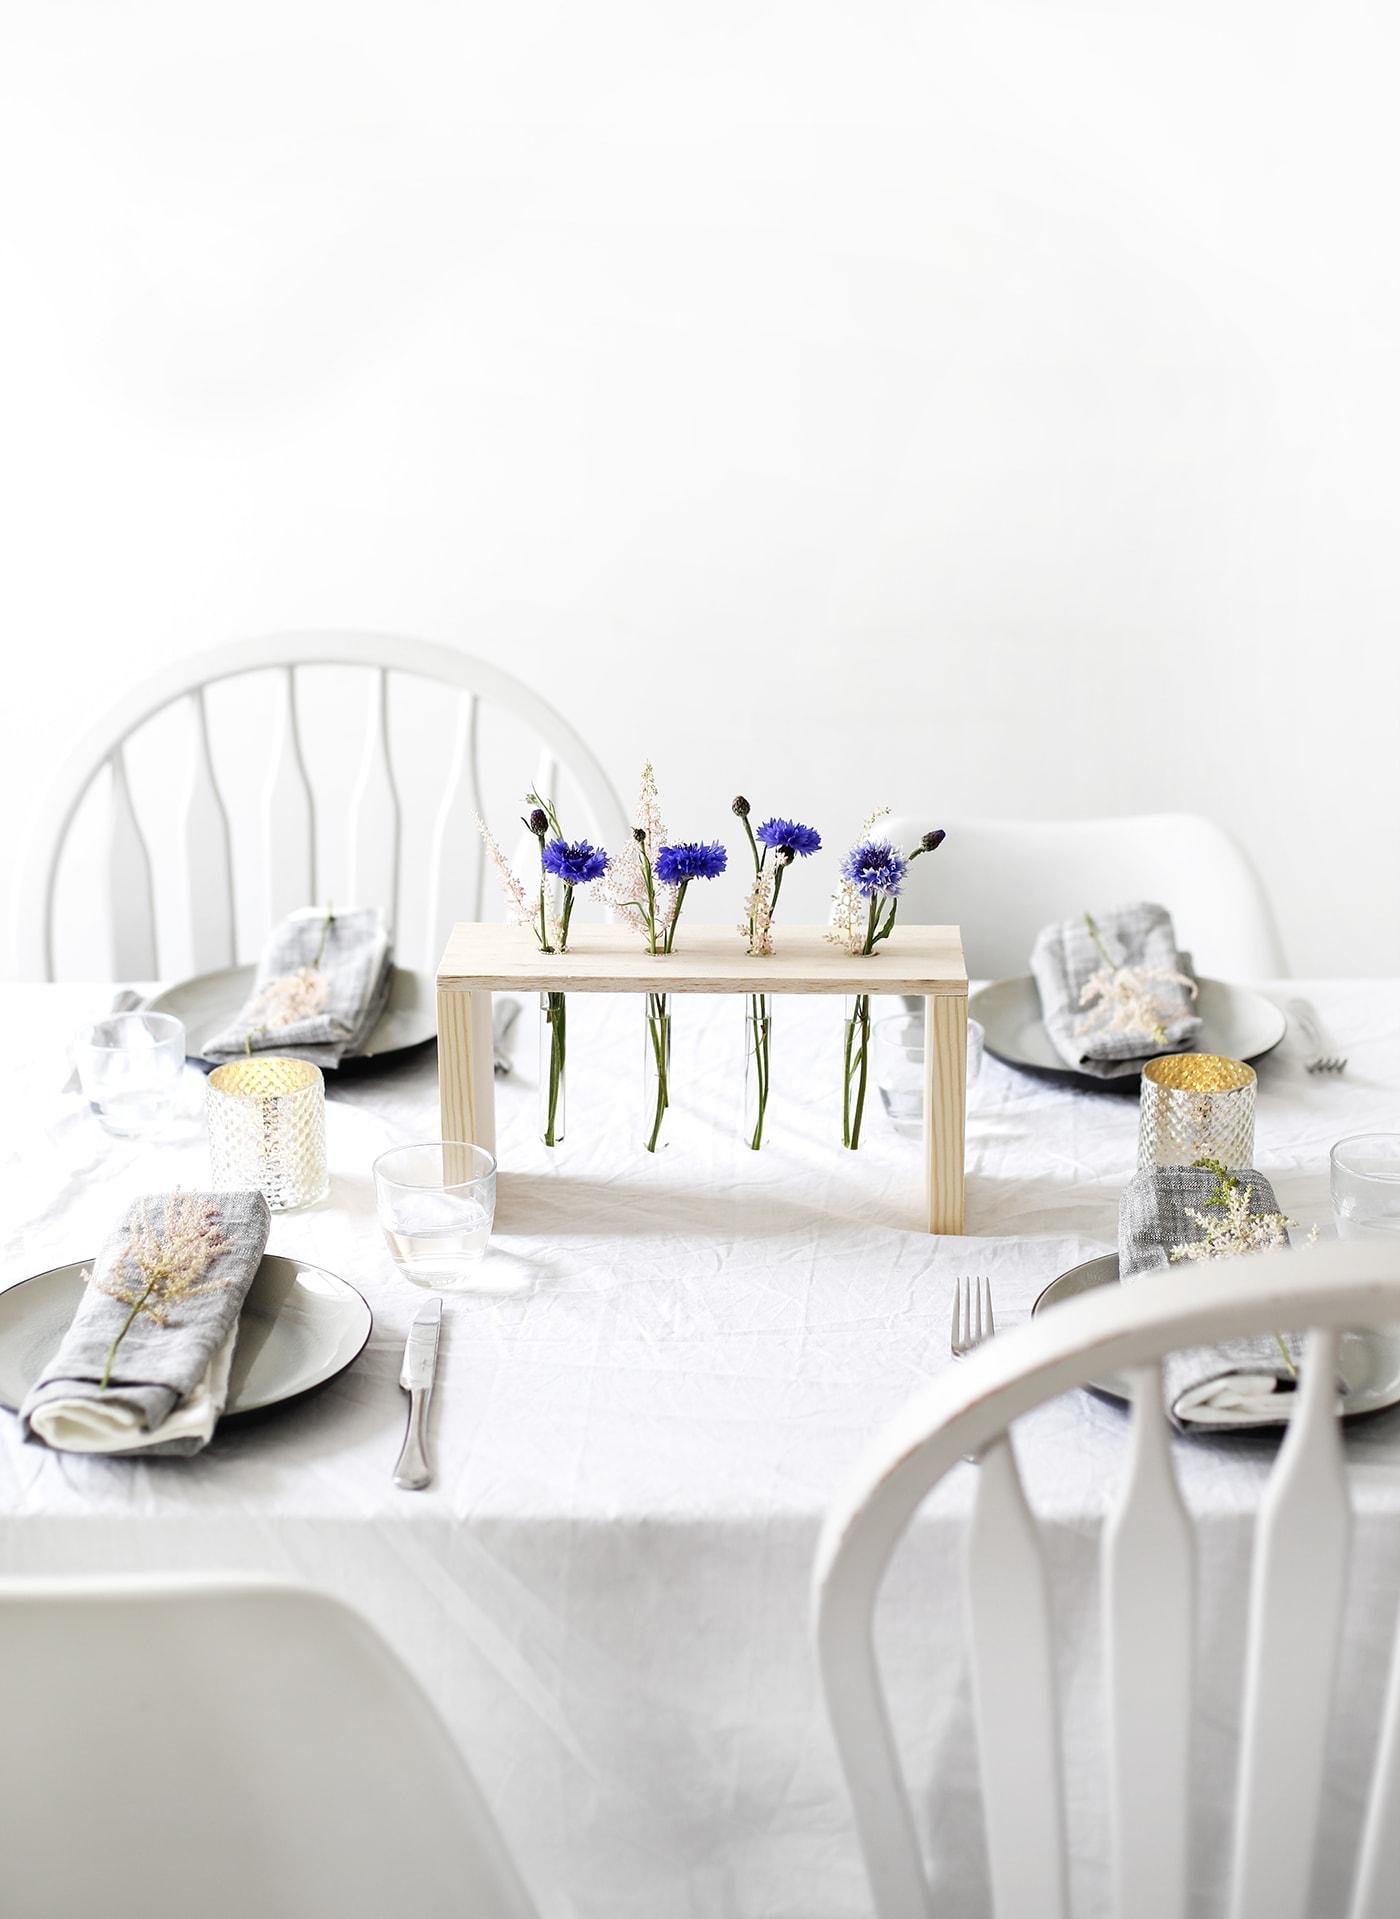 DIY floral table centre